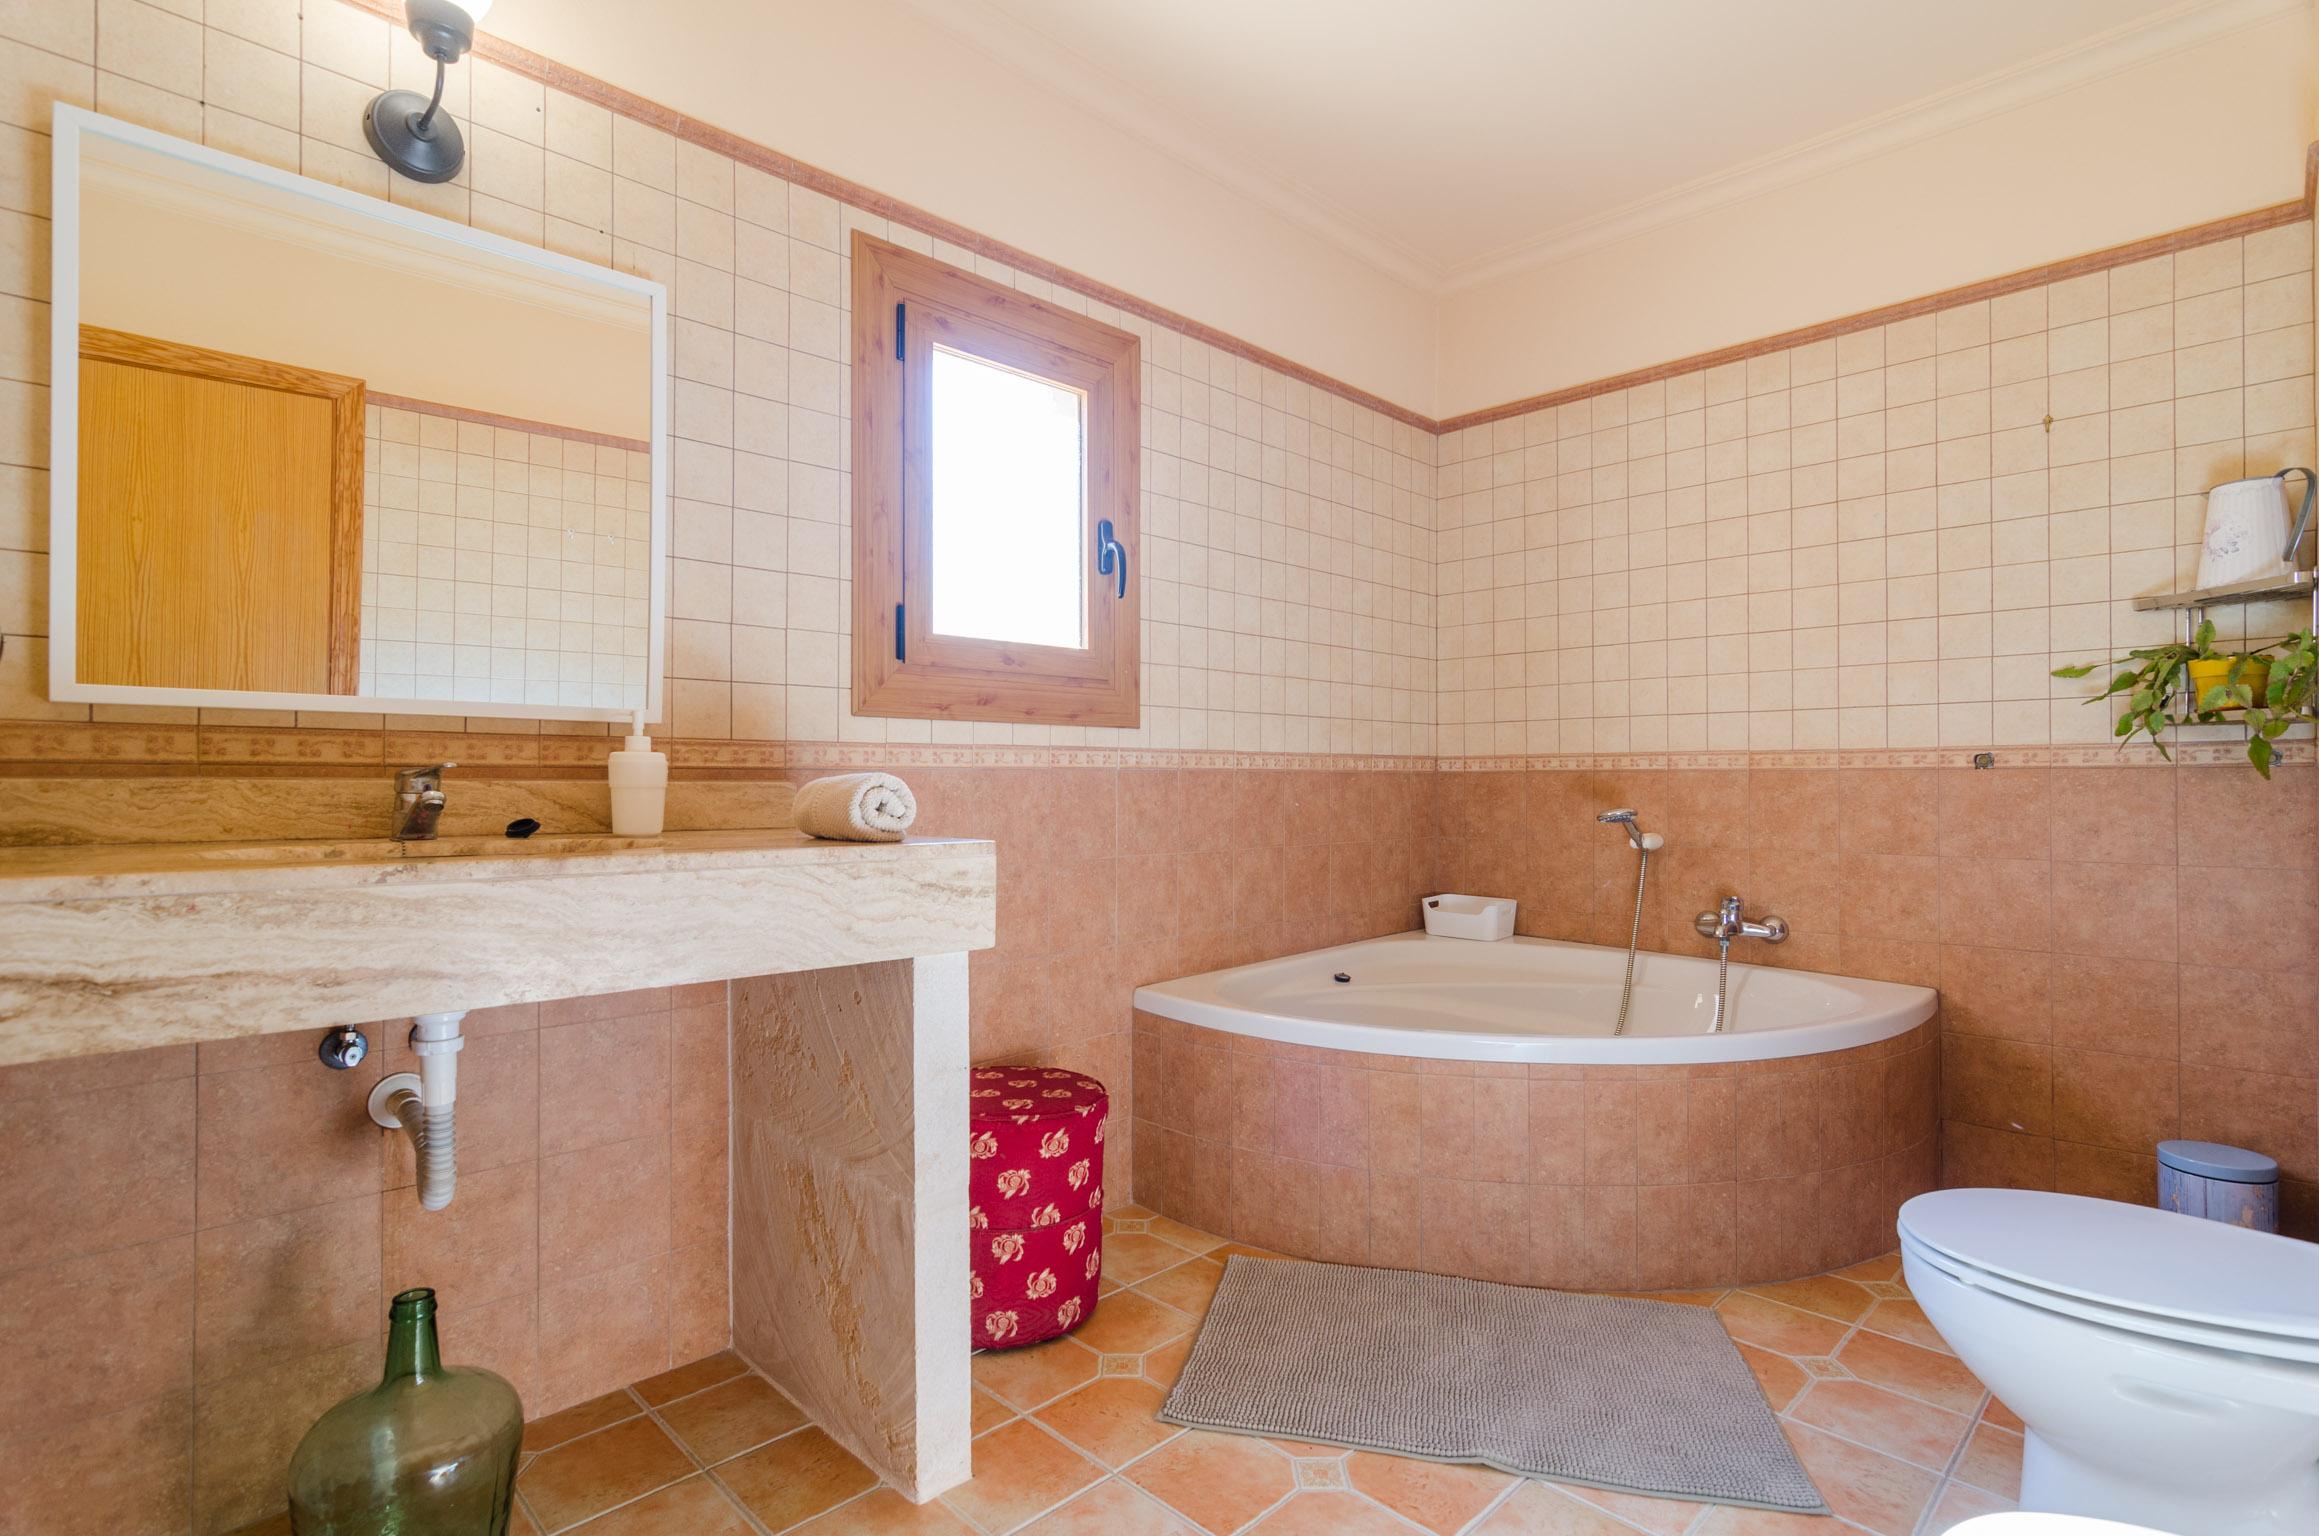 Ferienhaus SANT BLAI VELL (2284789), Campos, Mallorca, Balearische Inseln, Spanien, Bild 24